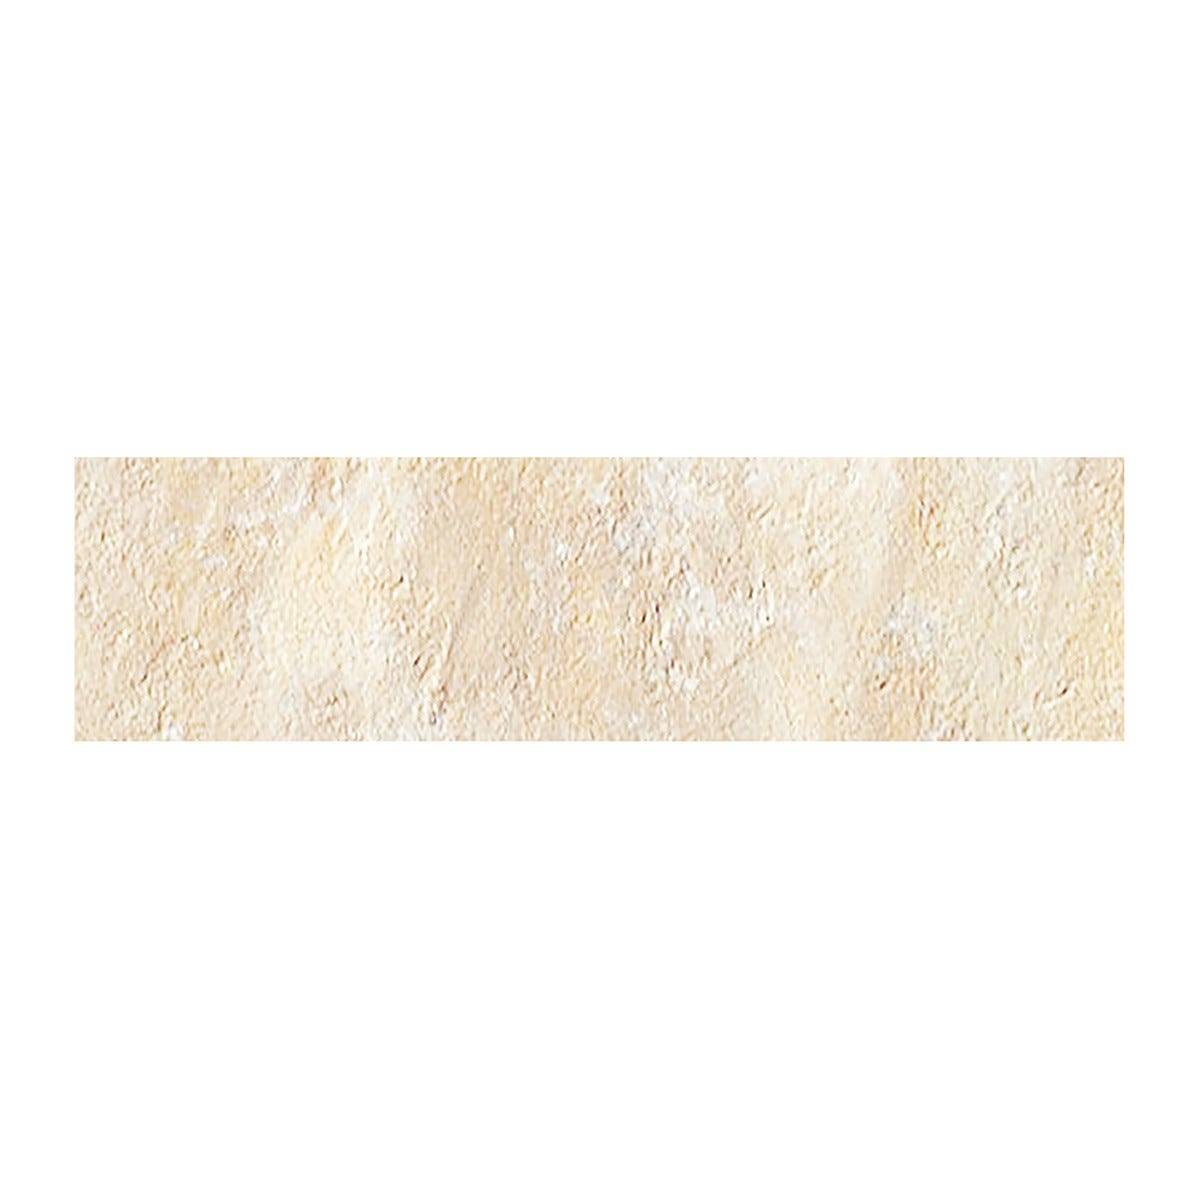 spray _dry mattoncino antico casale bianco 6x25x0,9 cm pei 5 r10 gres porcellanato